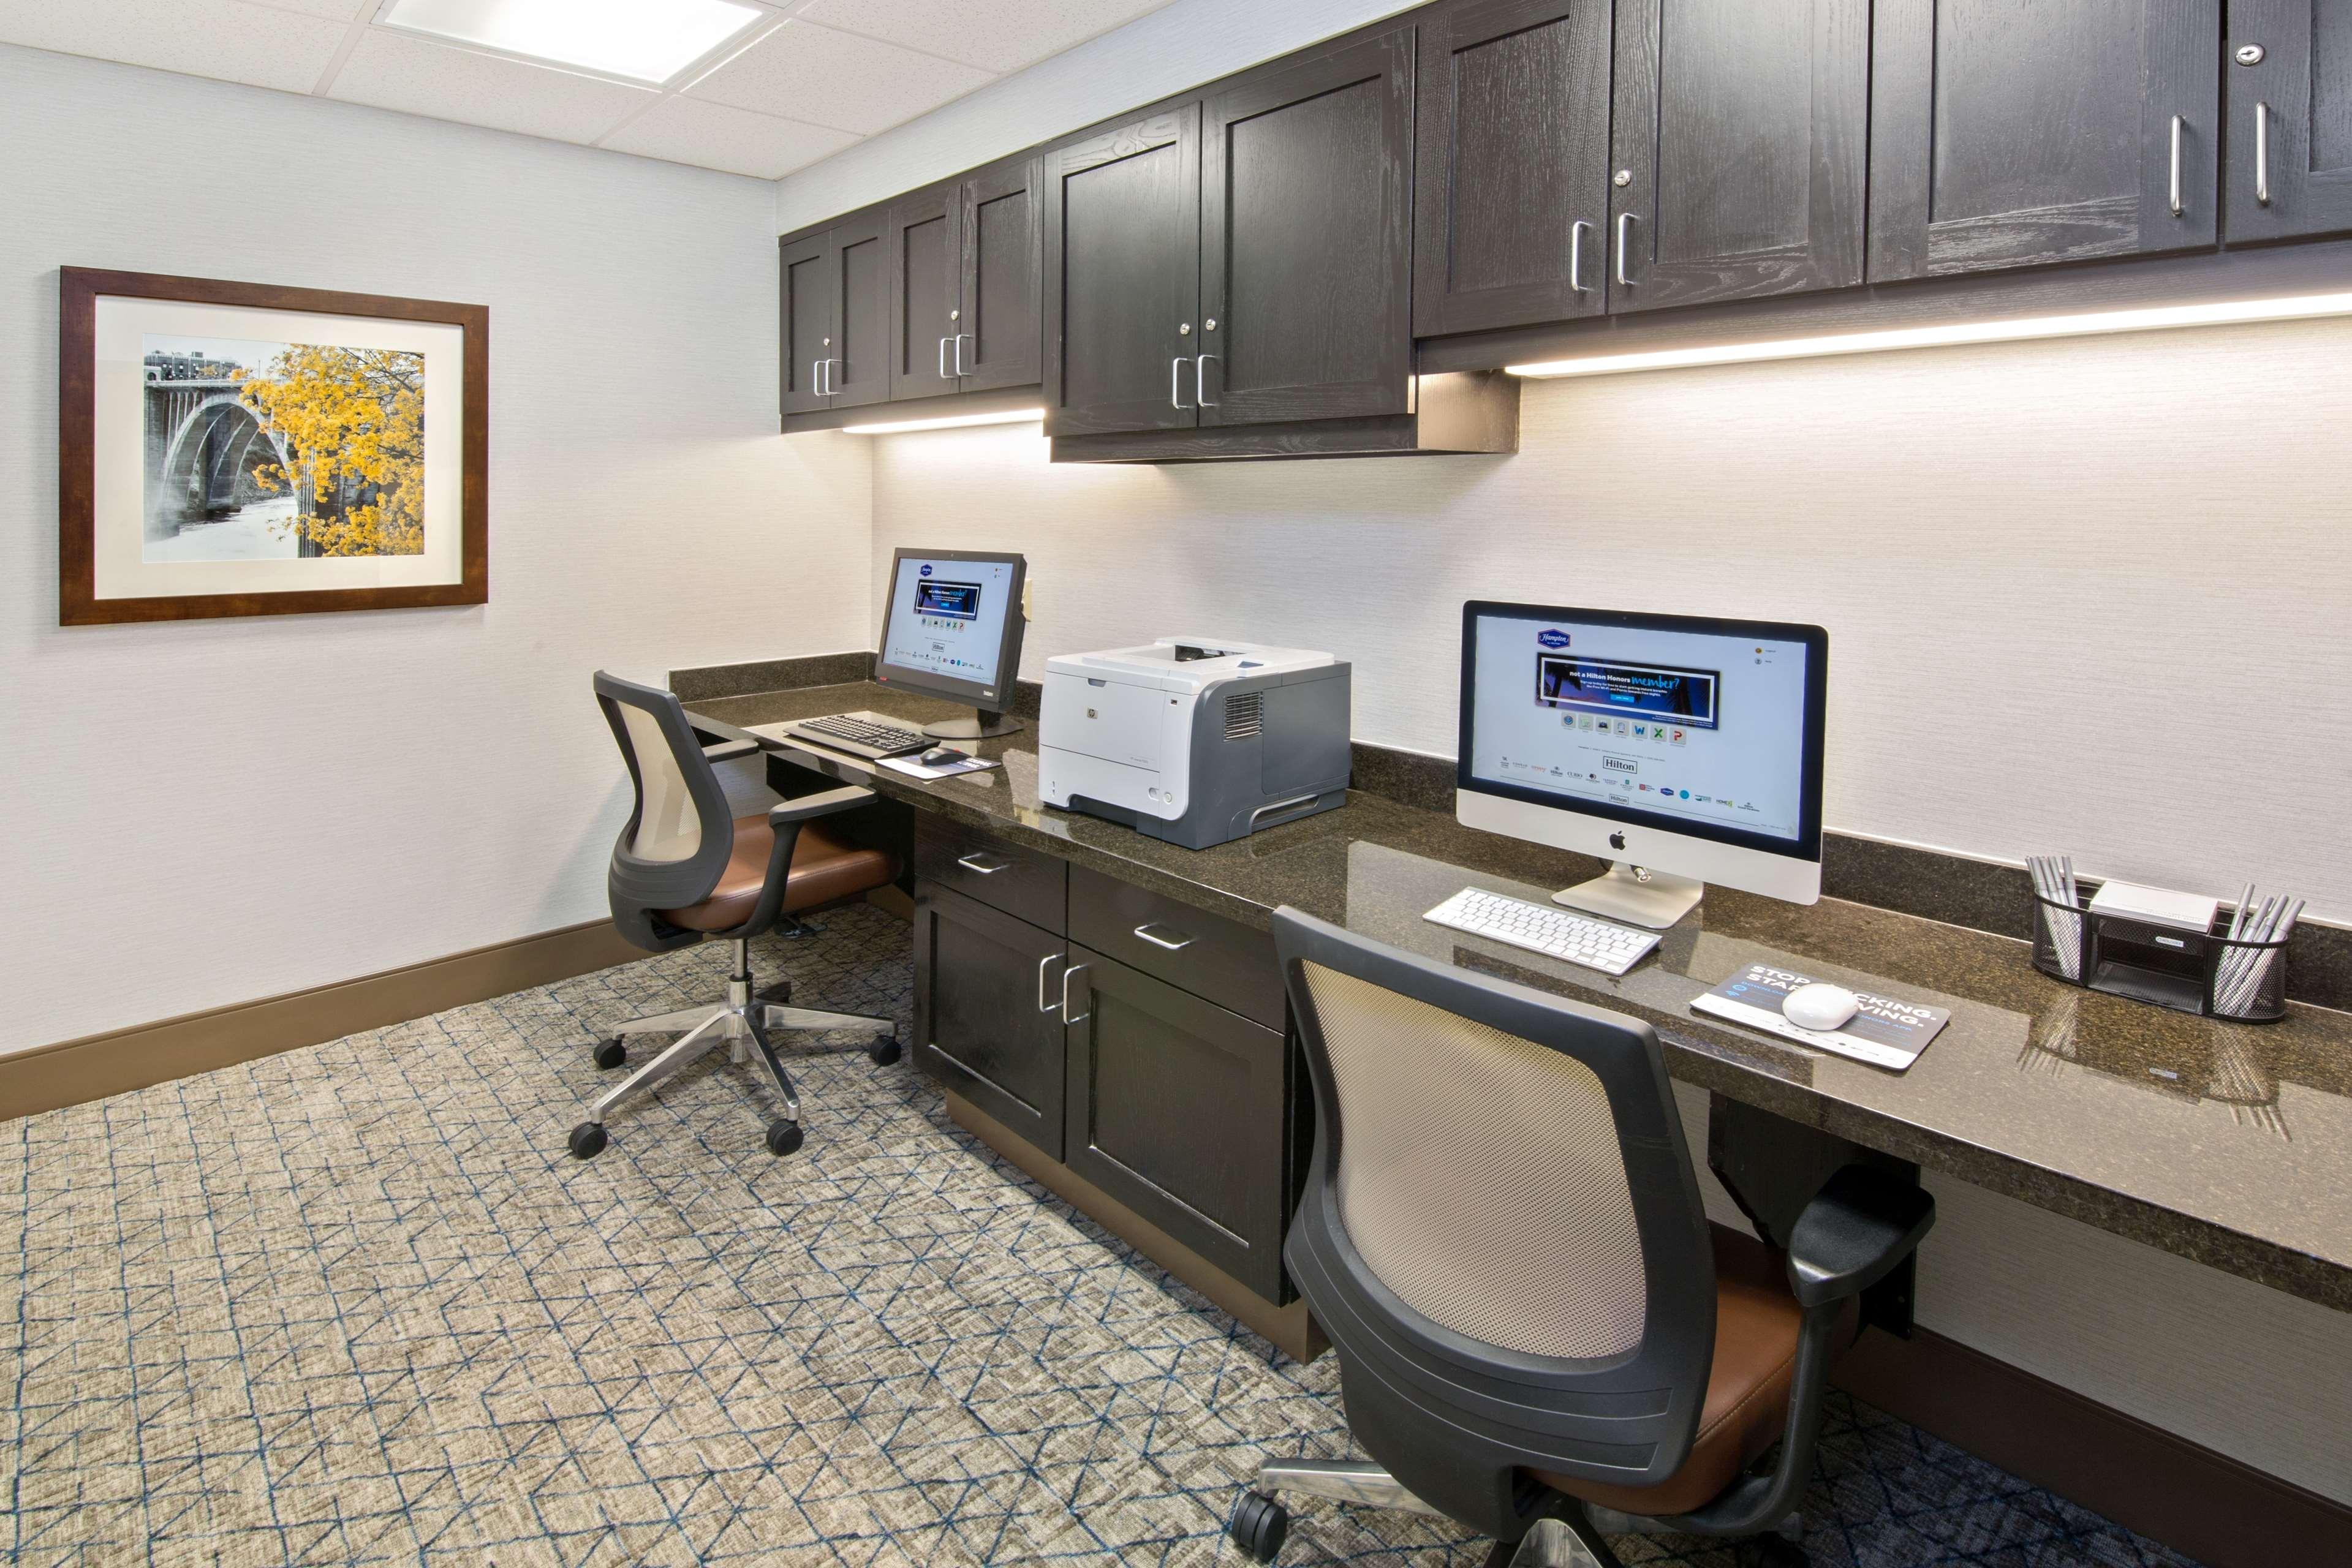 Hampton Inn & Suites Spokane Valley image 41